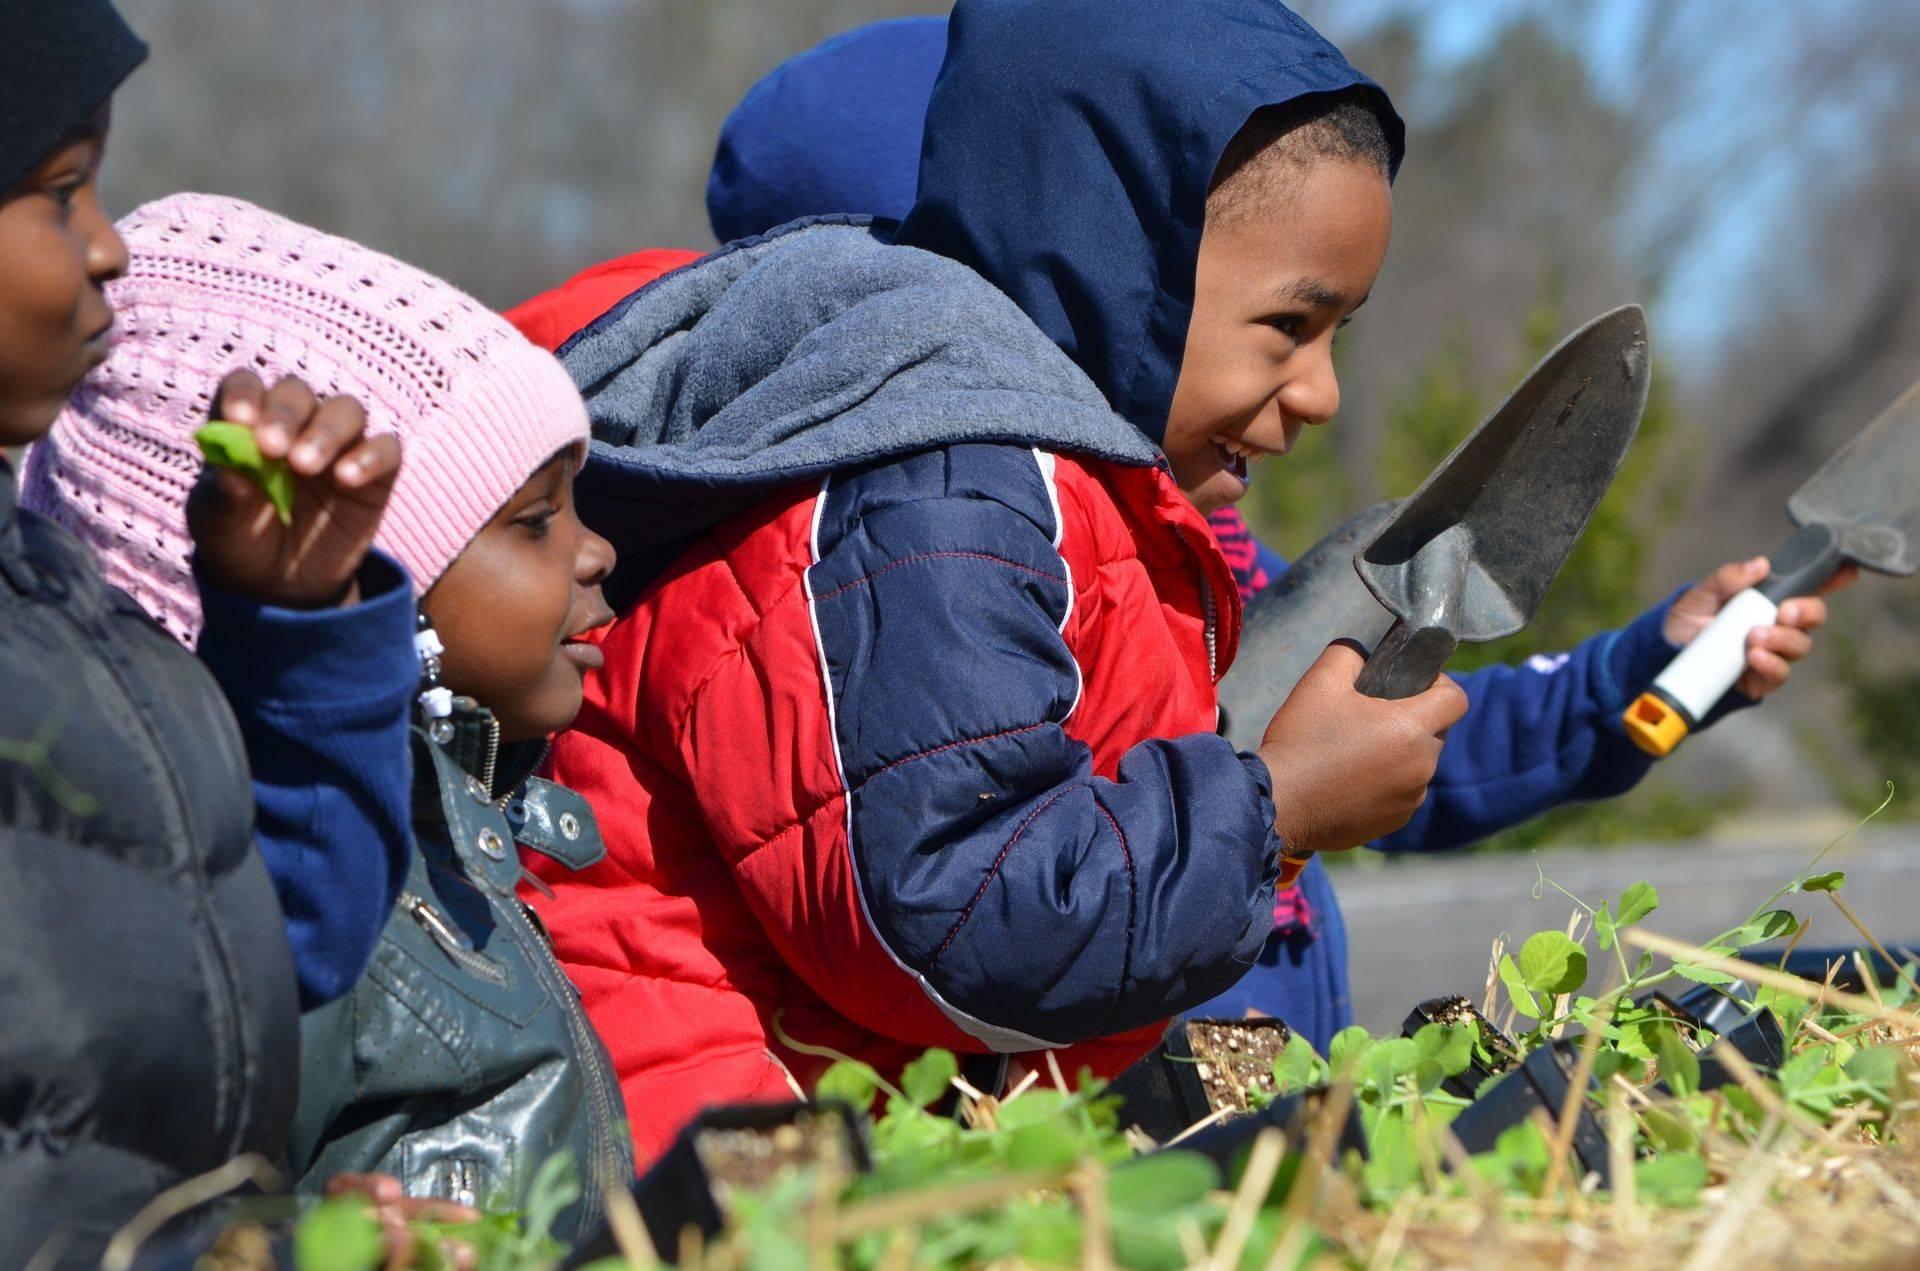 Children, smiles and gardens